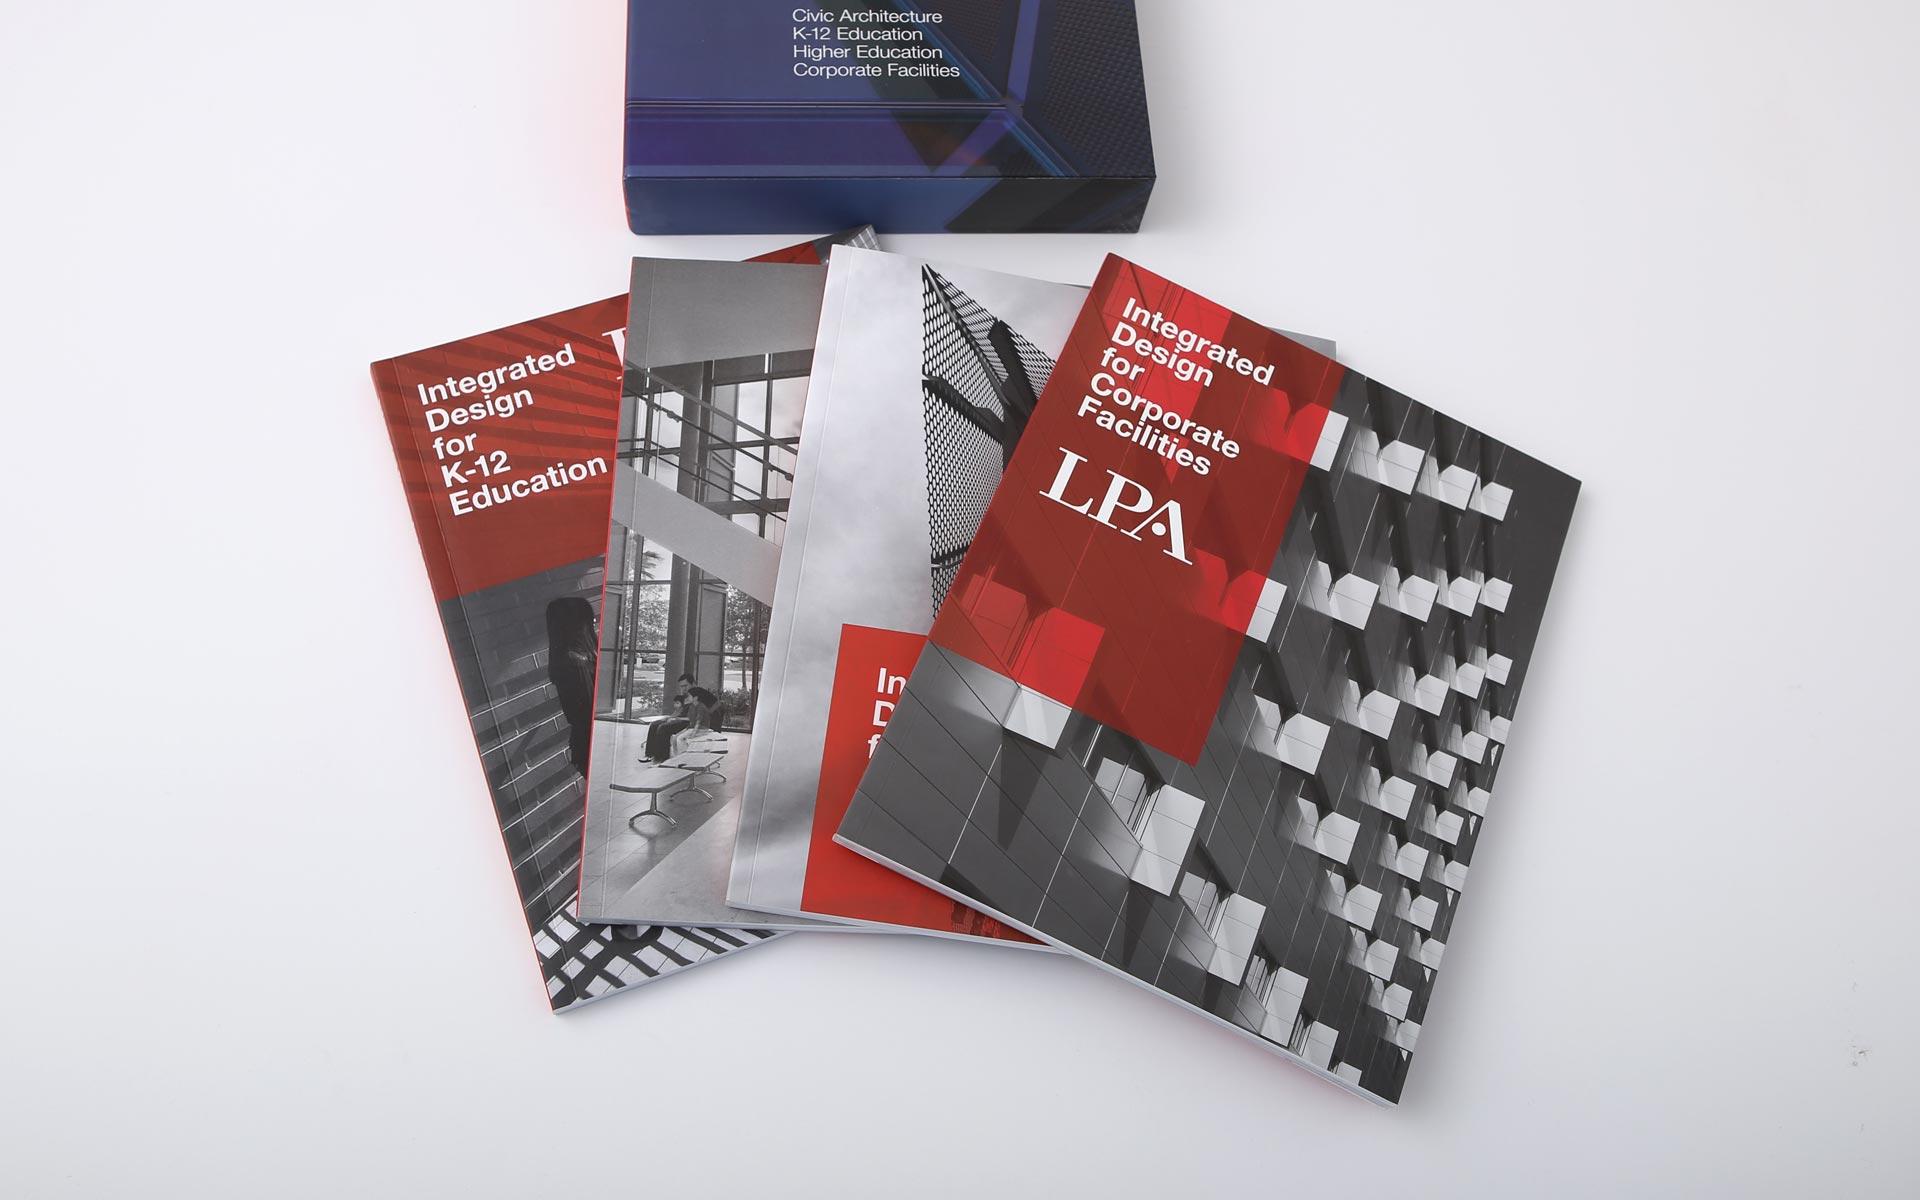 lpa-education-sports-book-design-2